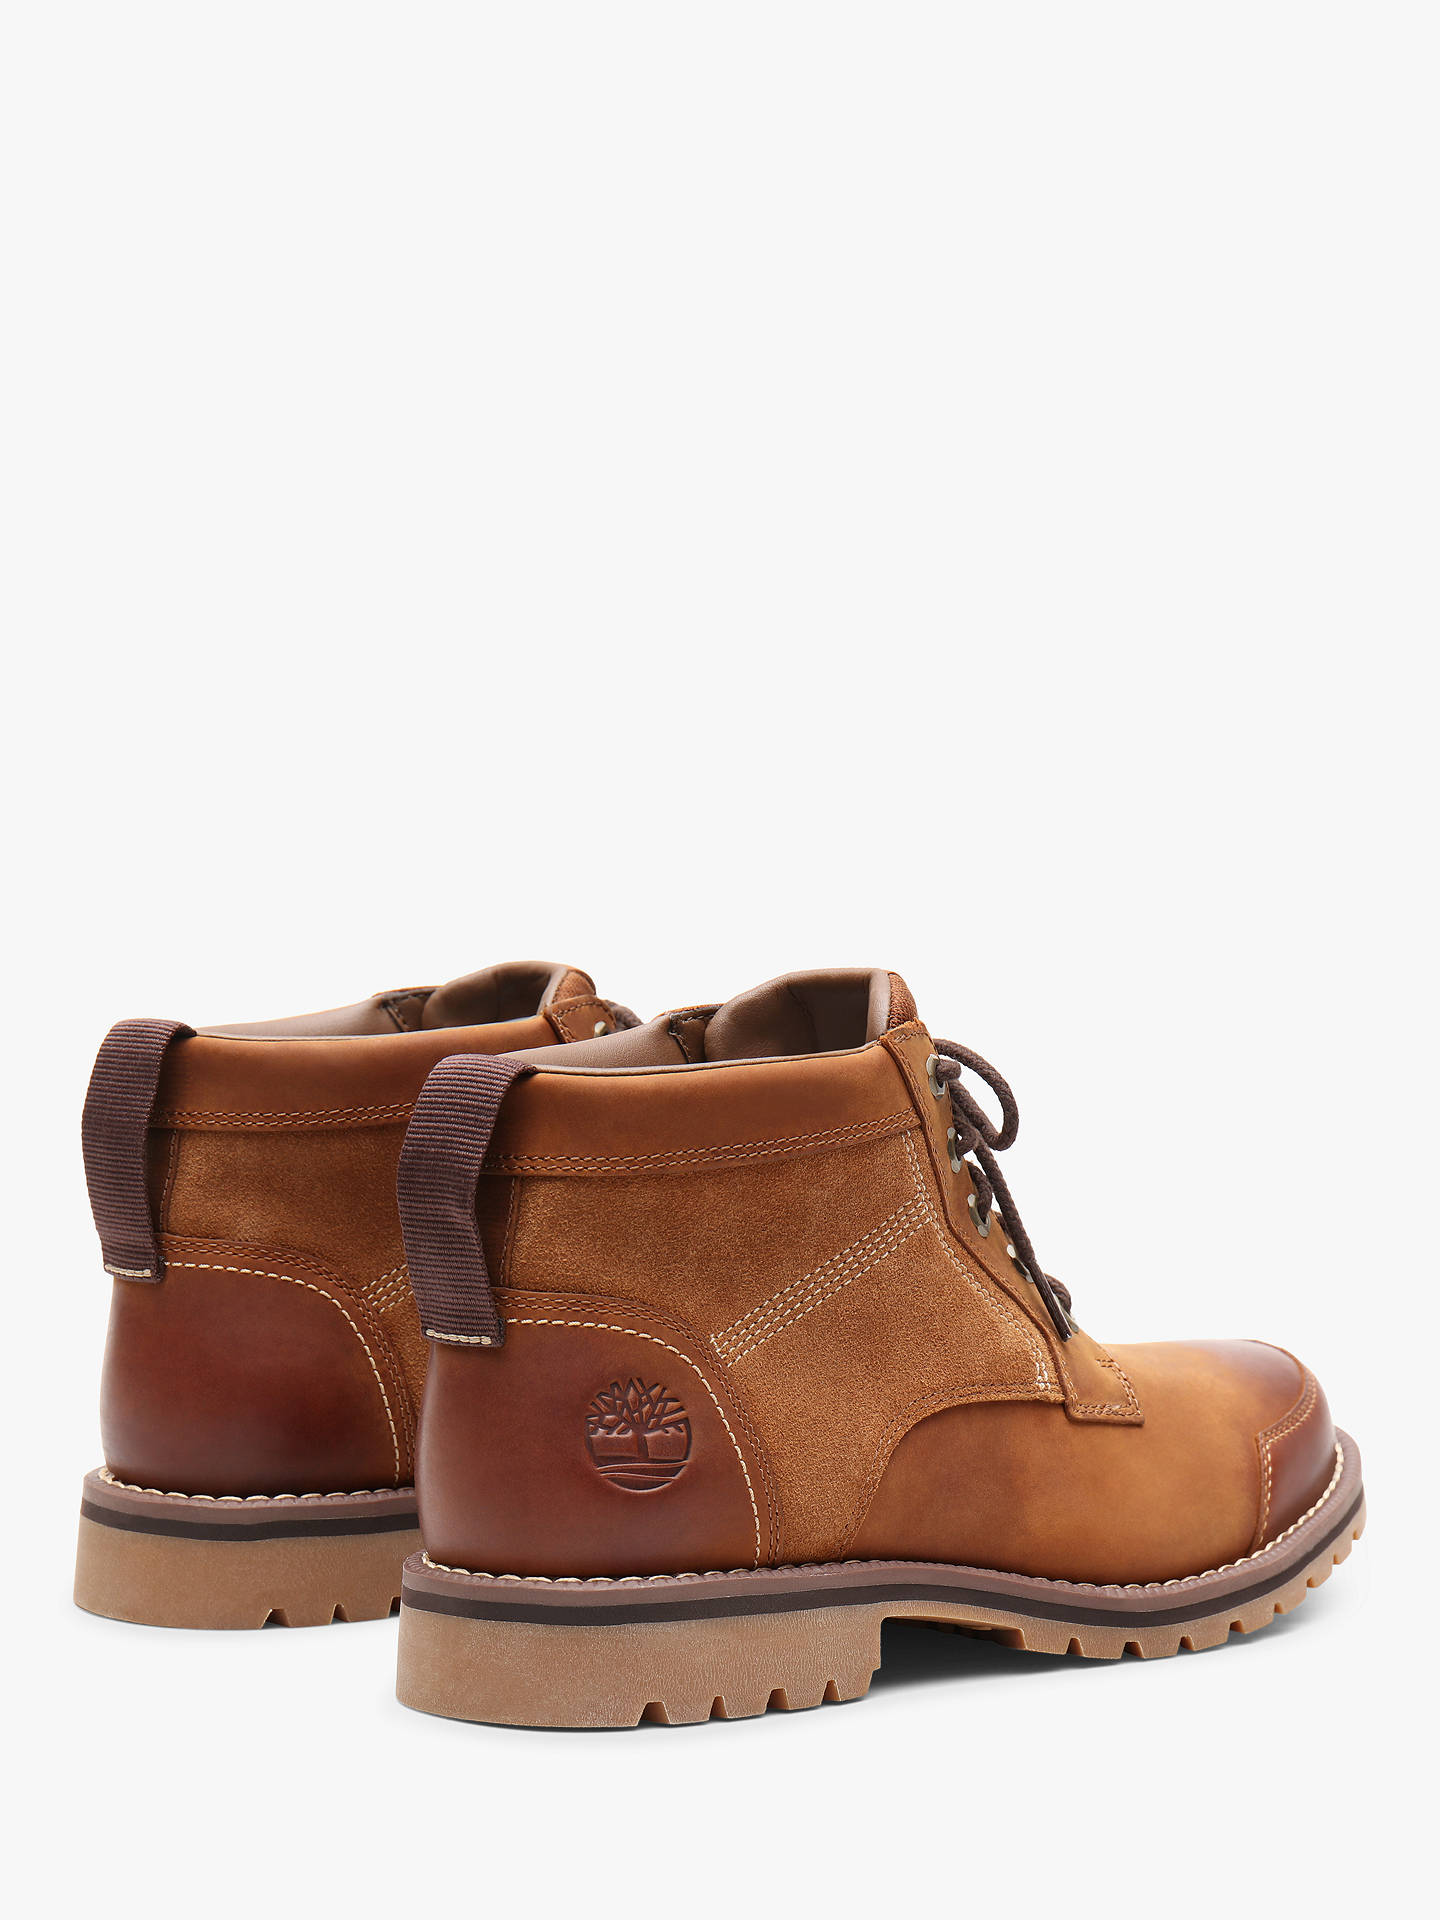 15396fe0e9a Timberland Larchmont Chukka Boot, Medium Brown, Medium Brown